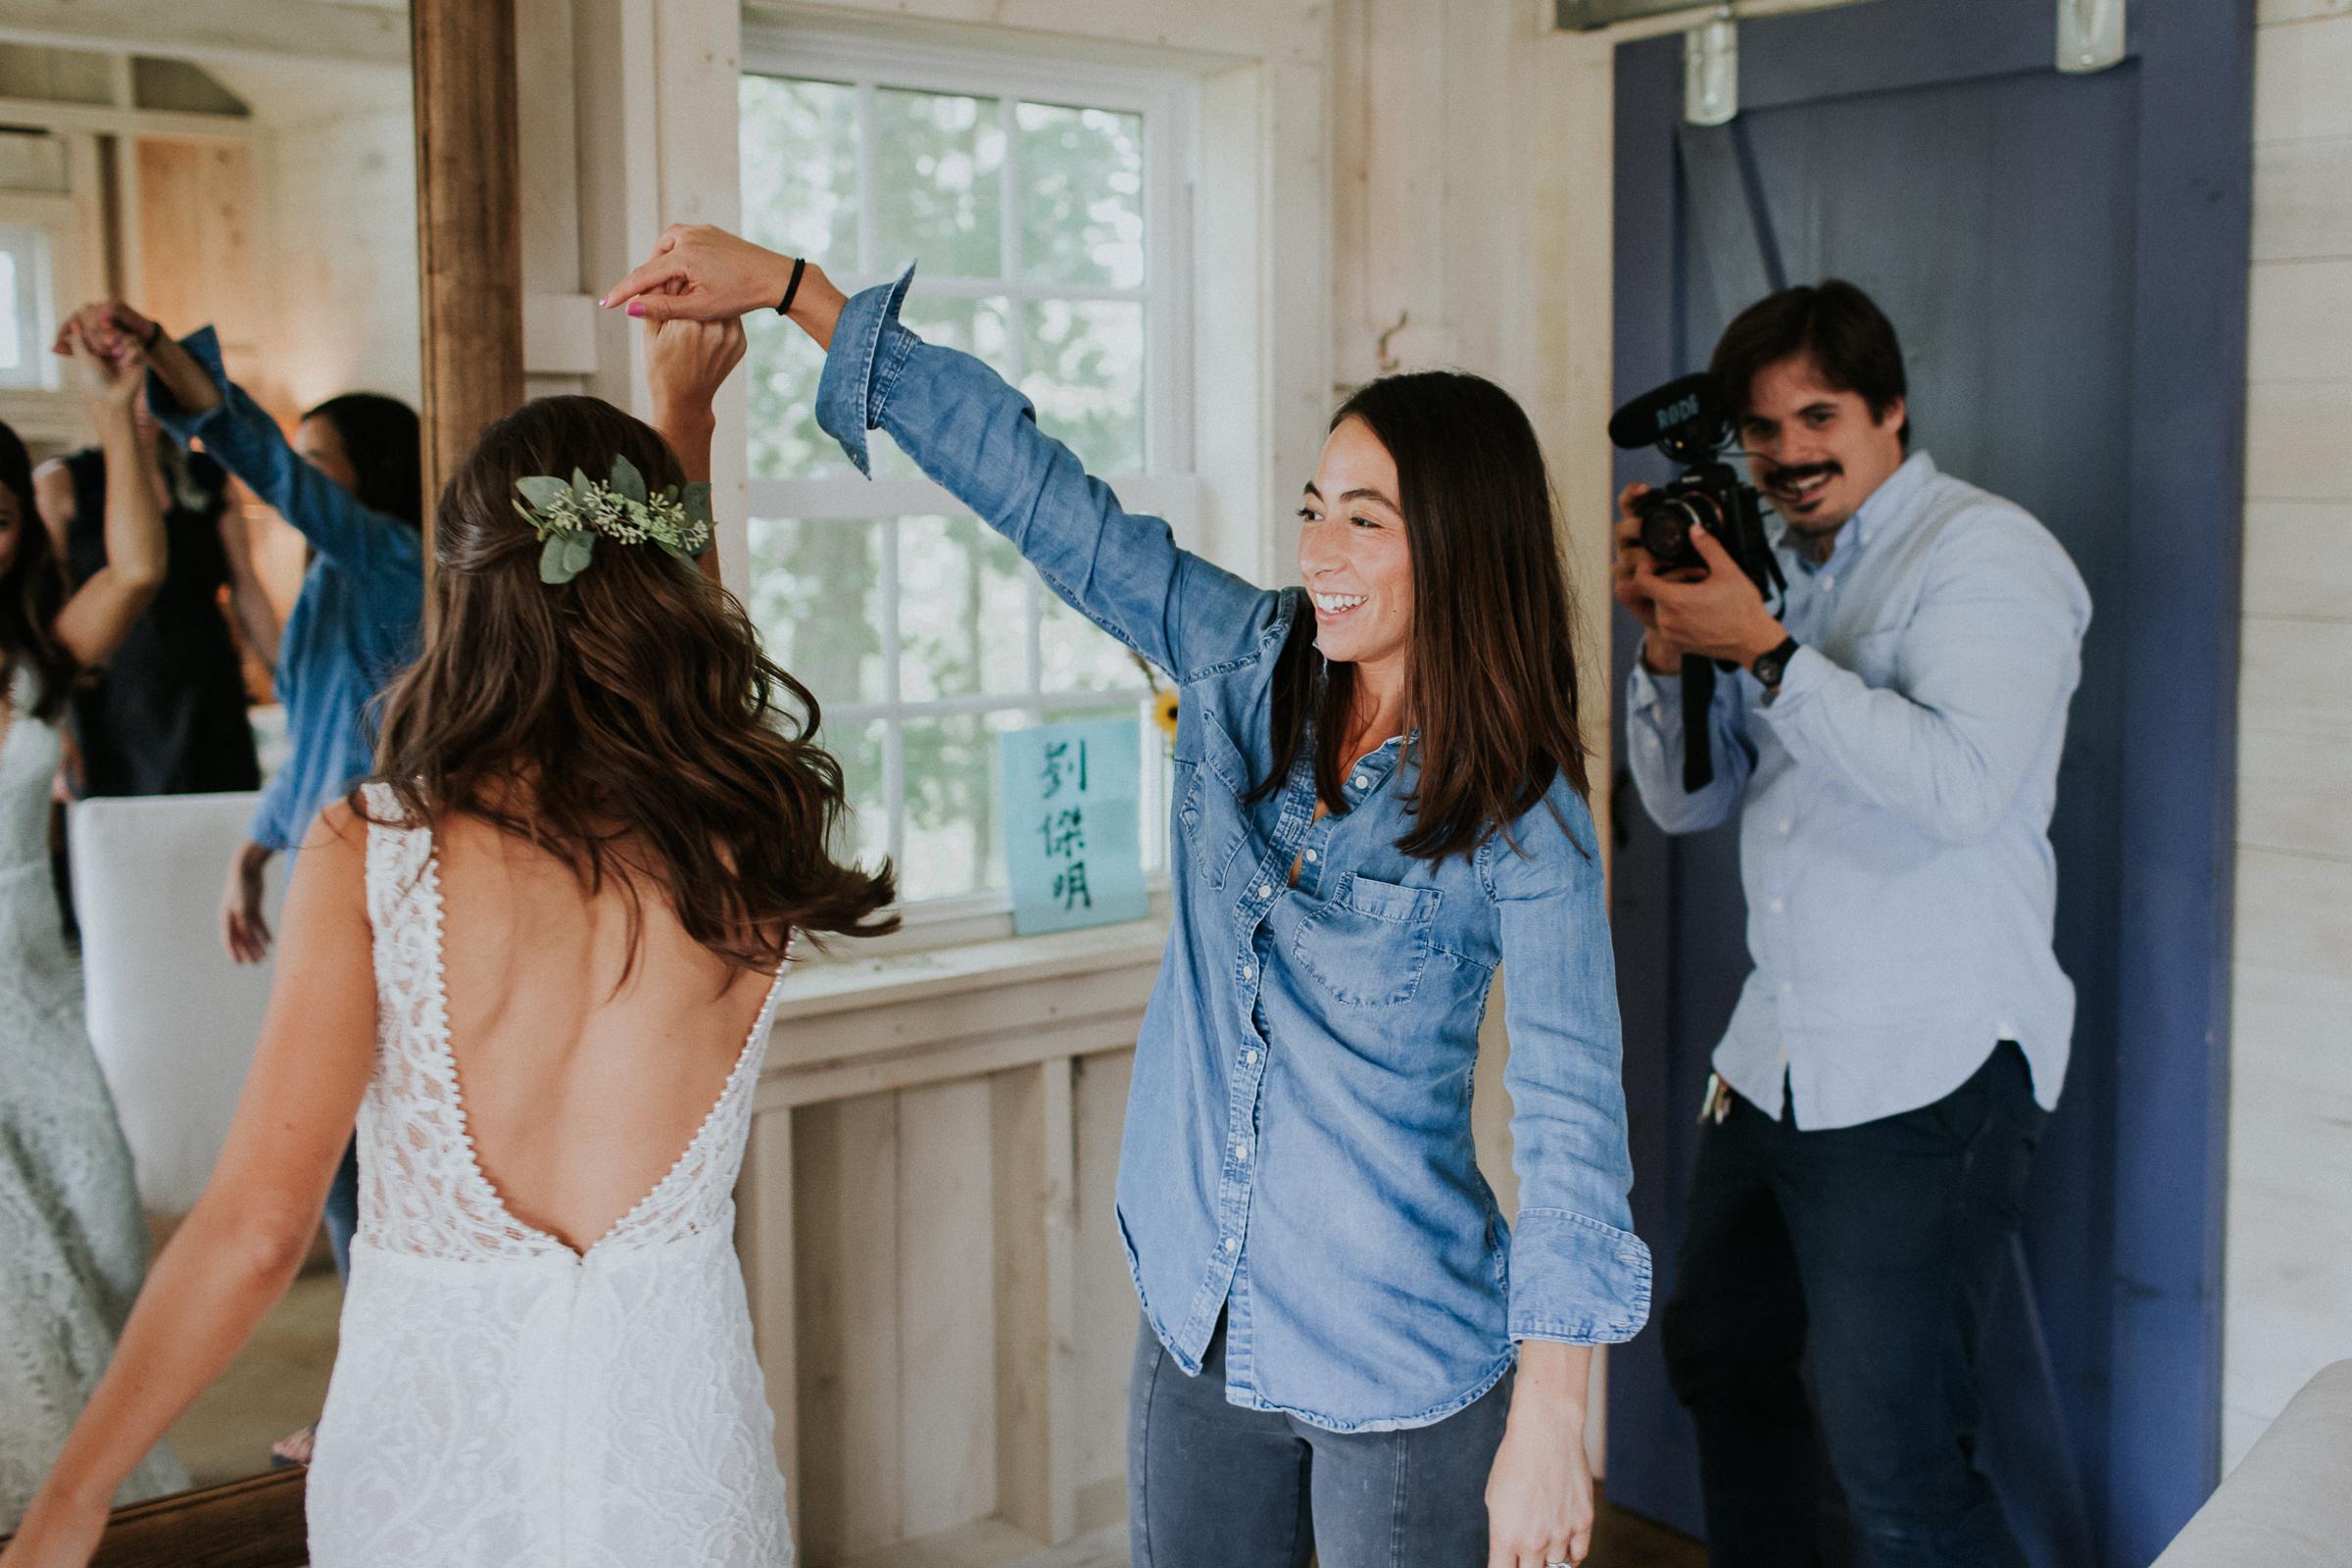 Marianmade-Farm-Wiscasset-Maine-Fine-Art-Documentary-Wedding-Photographer-Elvira-Kalviste-Photography-16.jpg